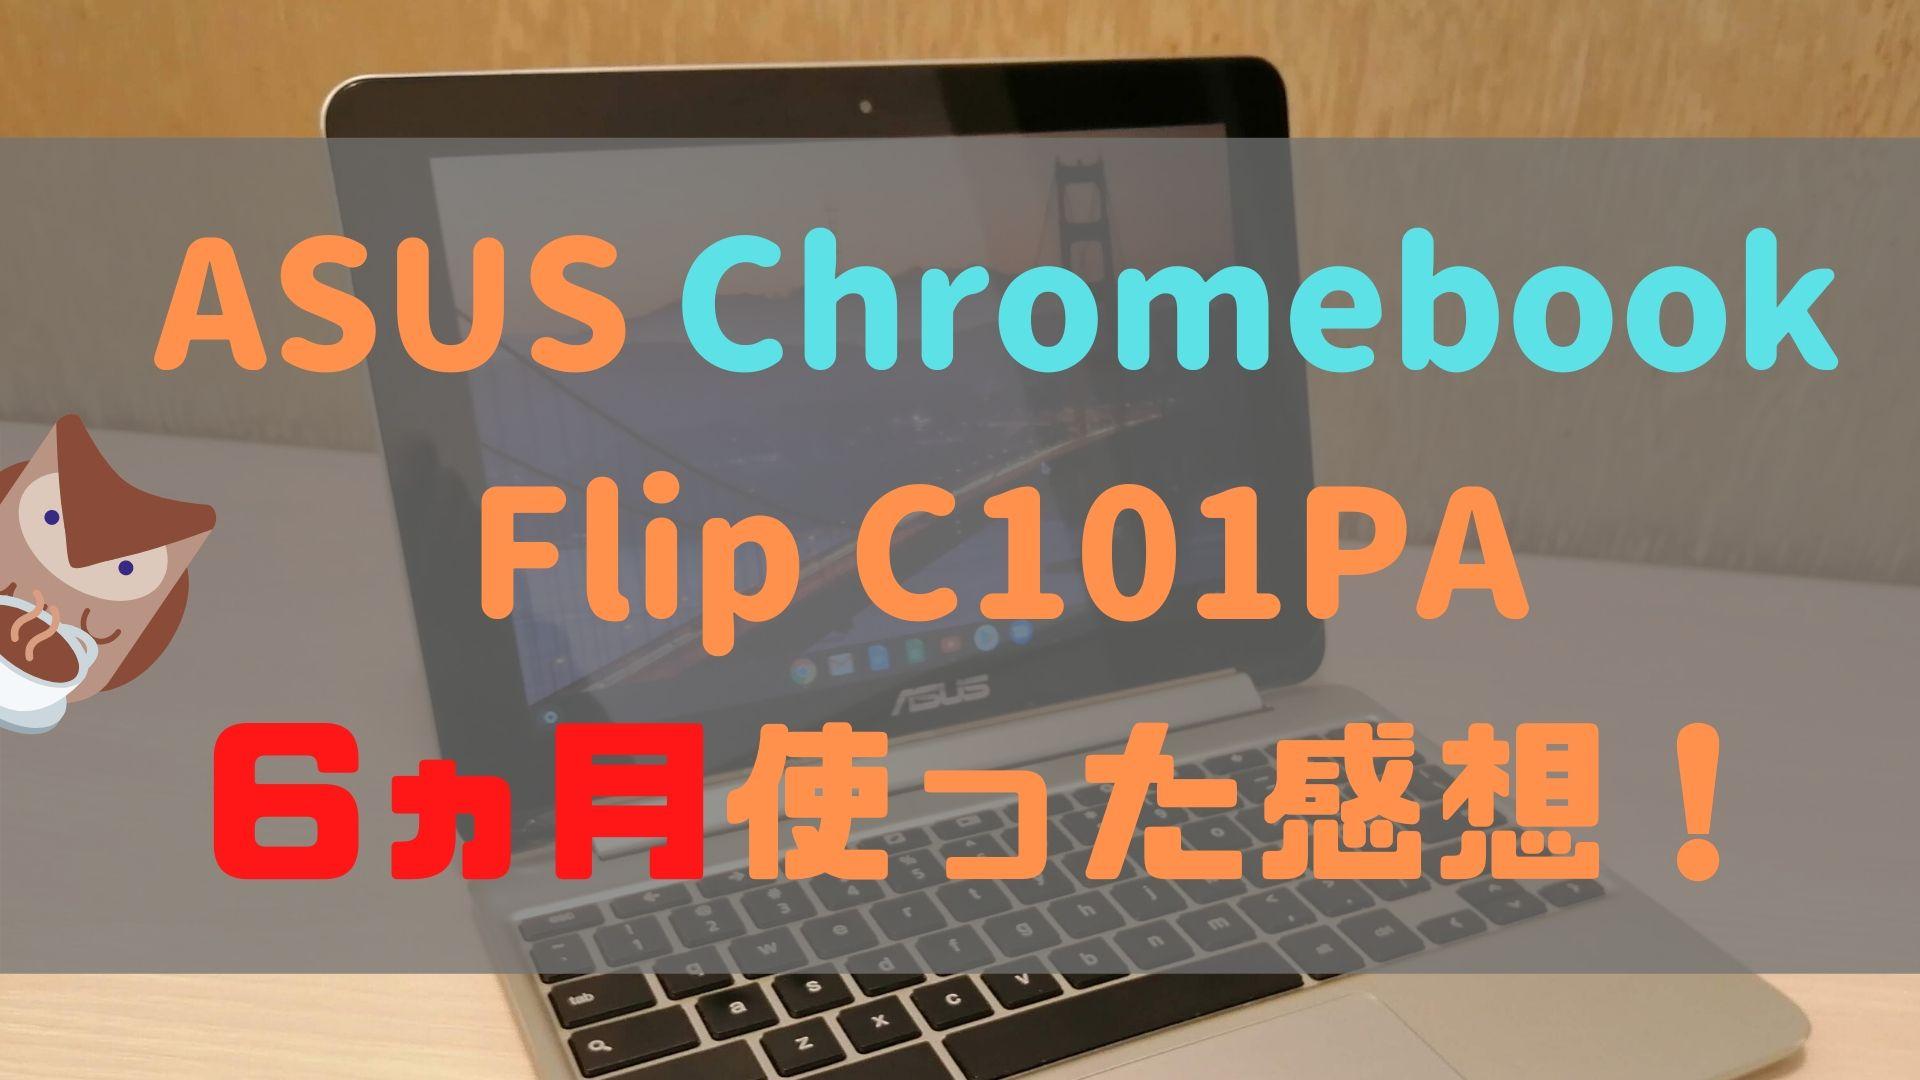 「ASUS Chromebook Flip C101PA」購入して6ヶ月の感想!